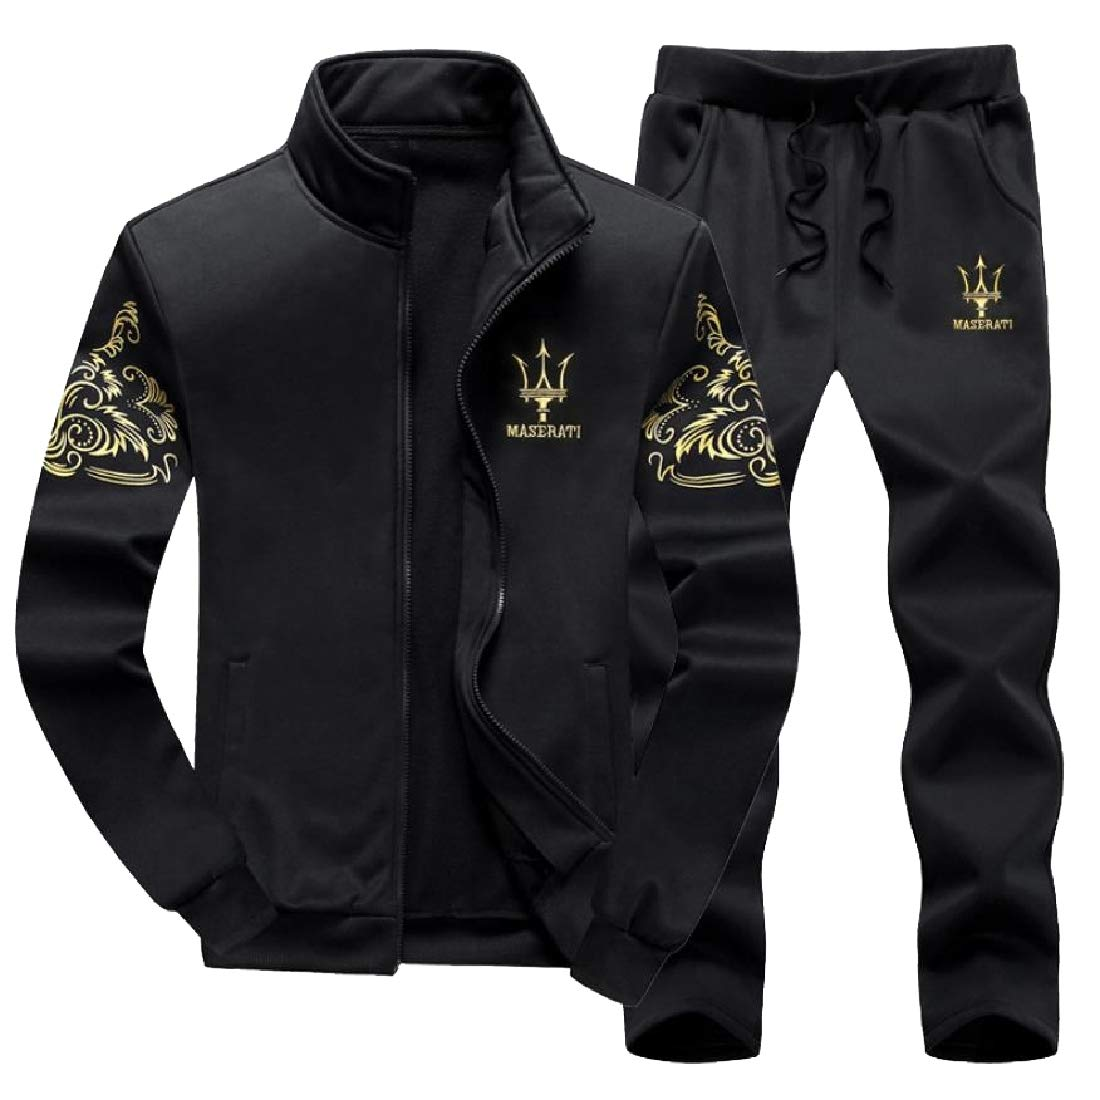 AS2 Small TaoNice Men's PlusSize Casual Premium Sweatshirt Hoodie & Pants Set